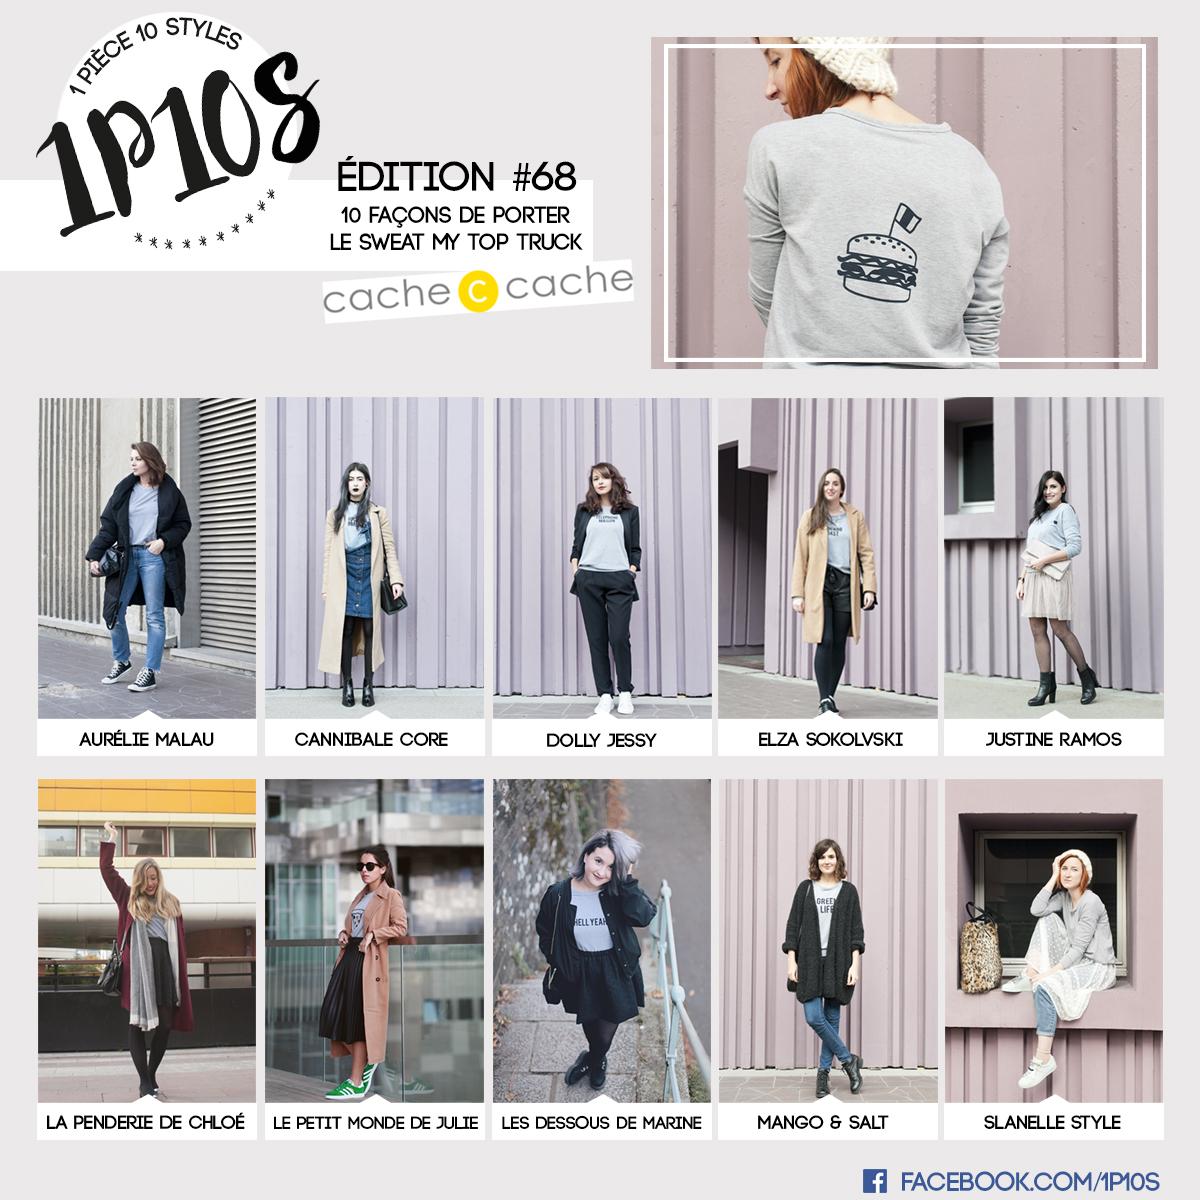 planche-1p10s_cachecache